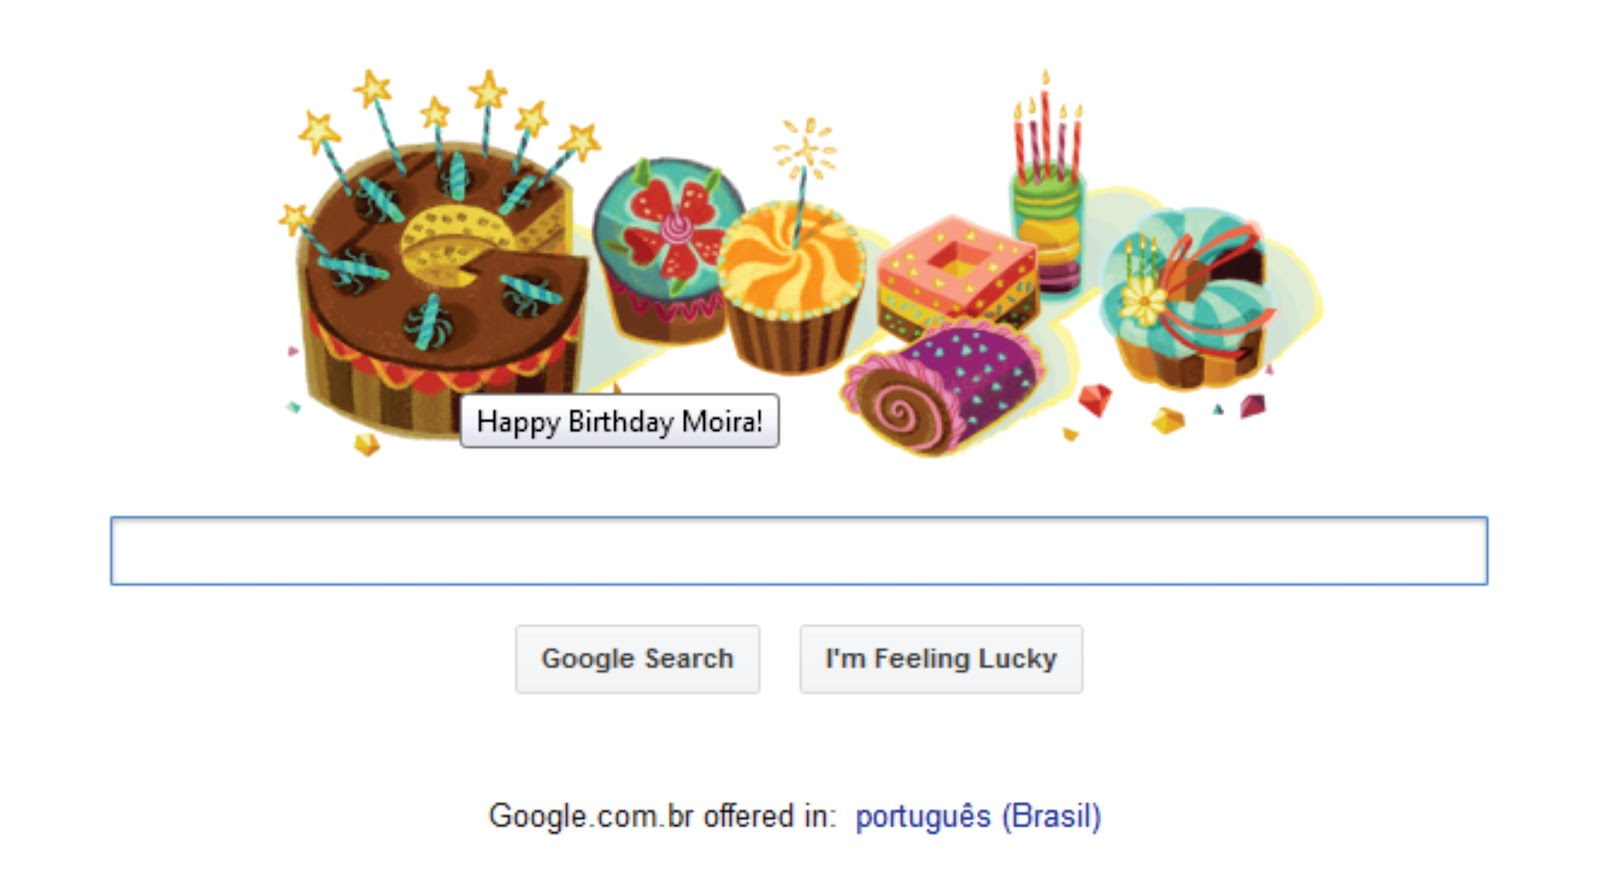 Google Comemorando Meu Aniversario